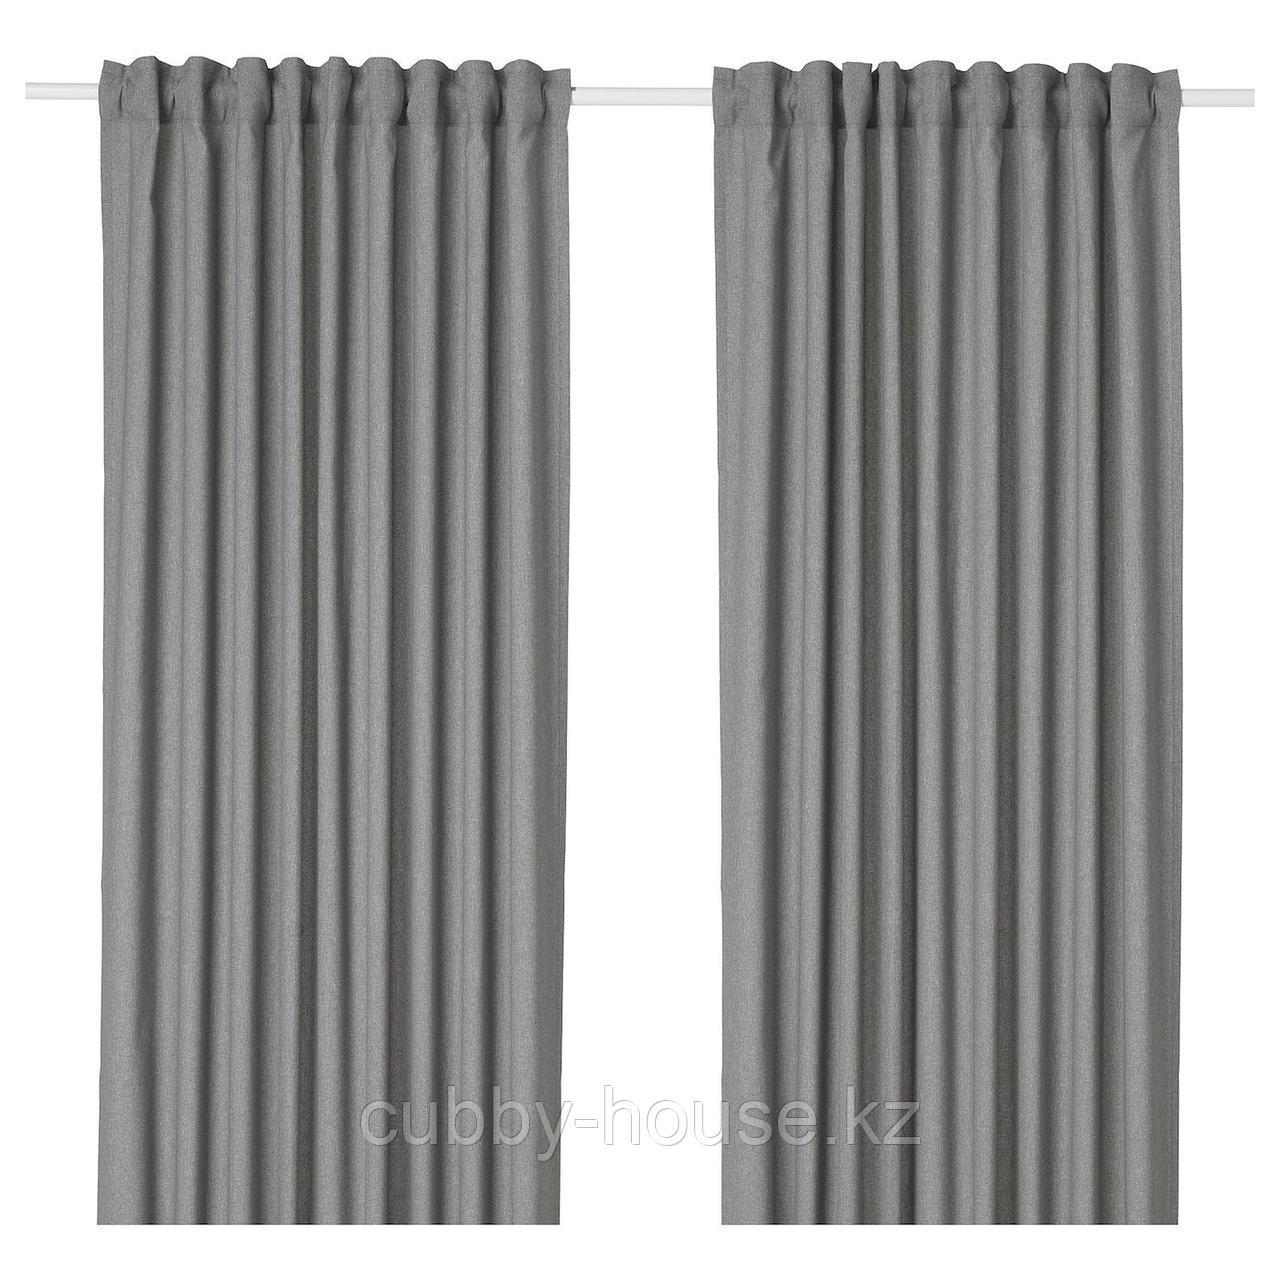 ХАННАЛЕНА Затемняющие гардины, 1 пара, серый, 145x300 см